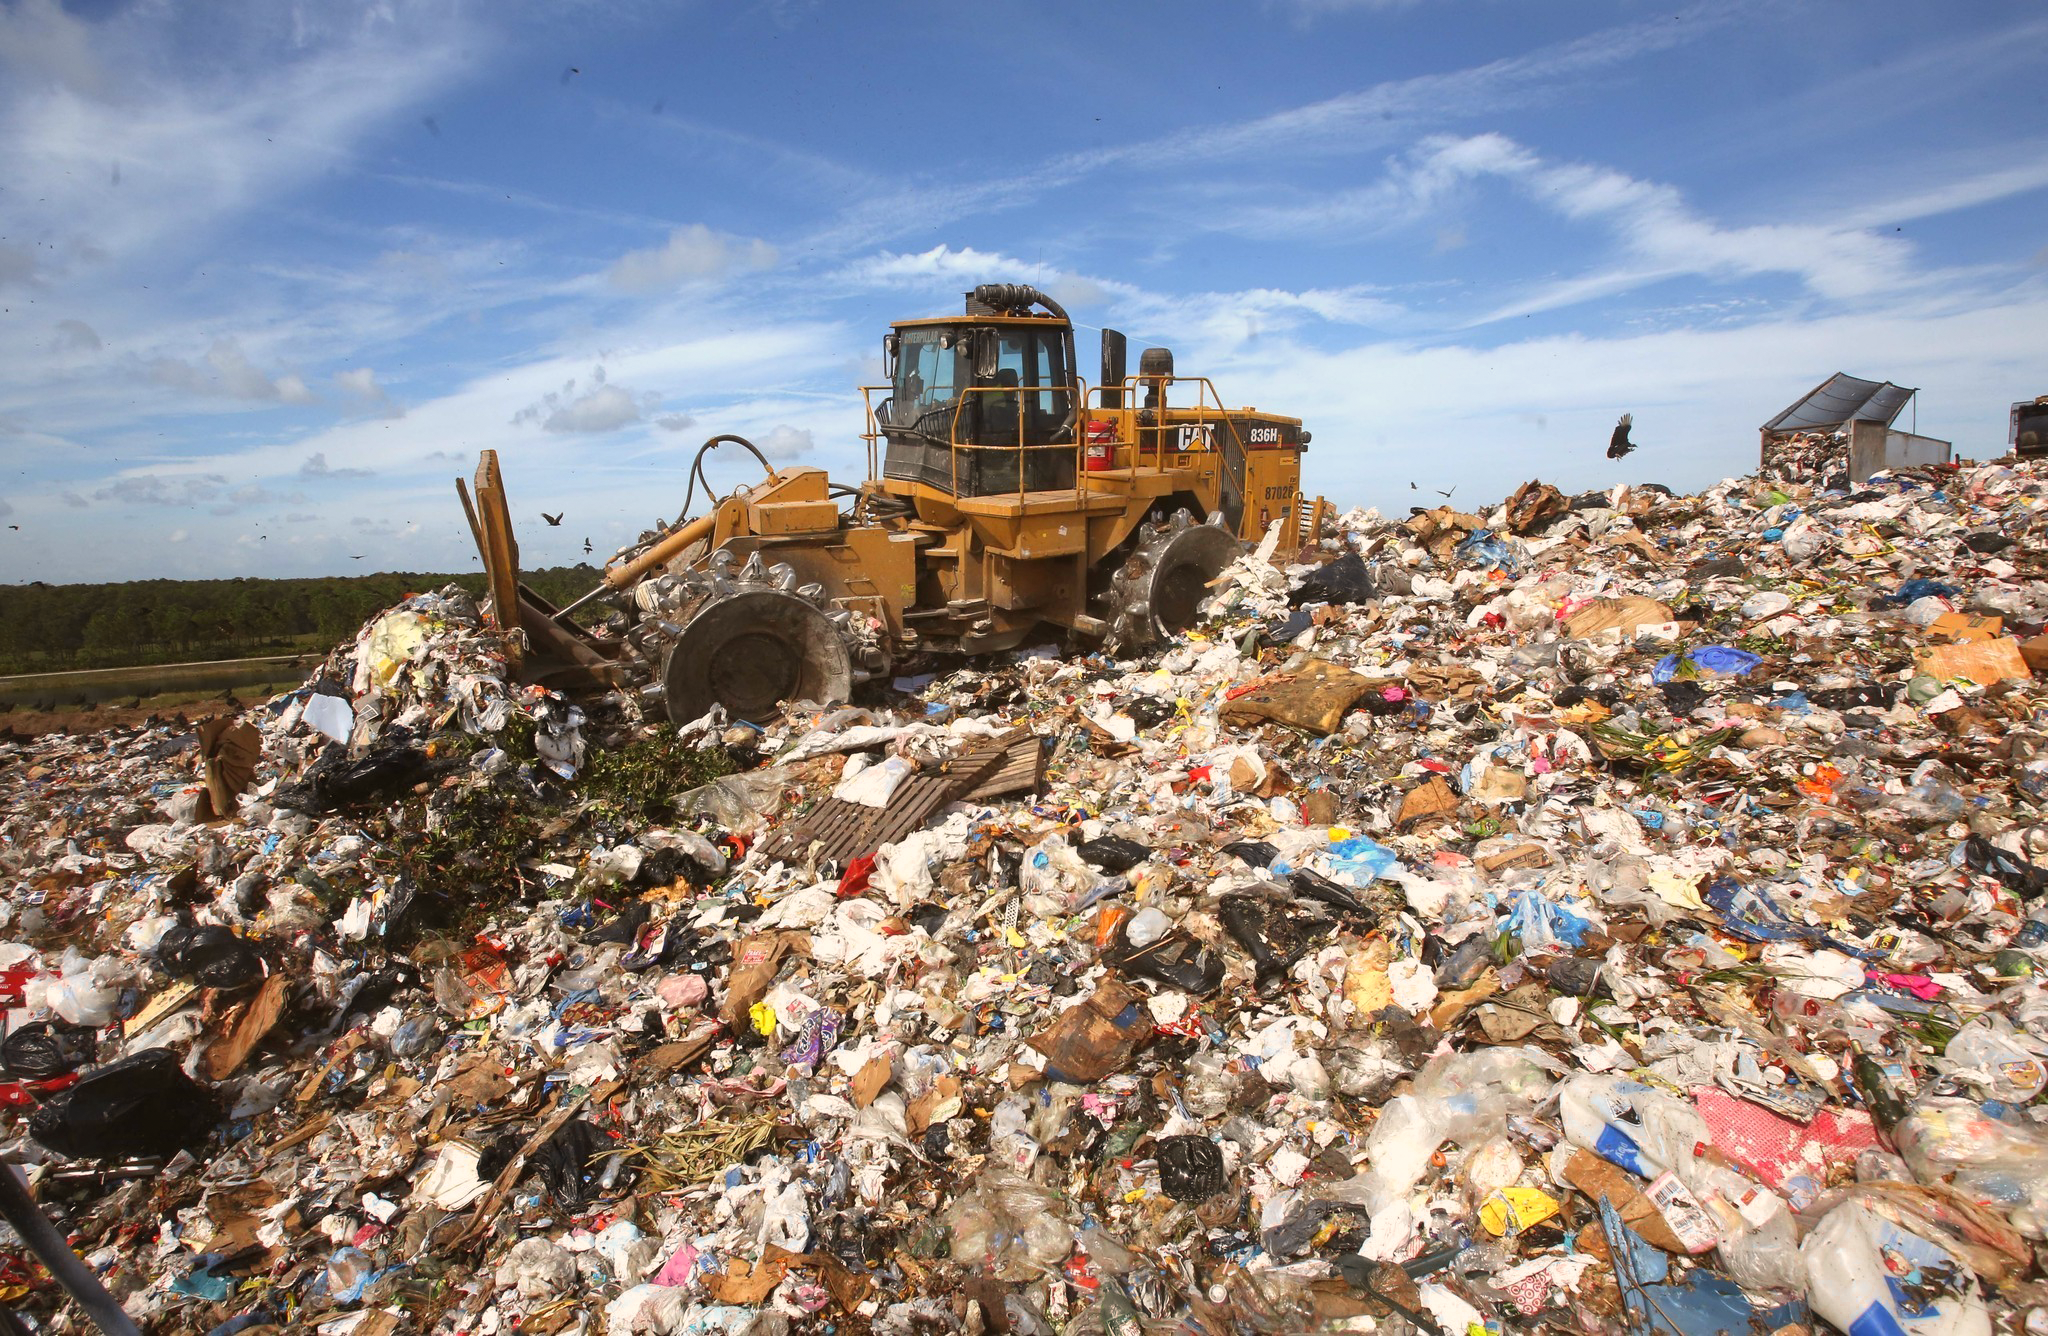 os-landfill-stinks-avalon-park-20150917.png